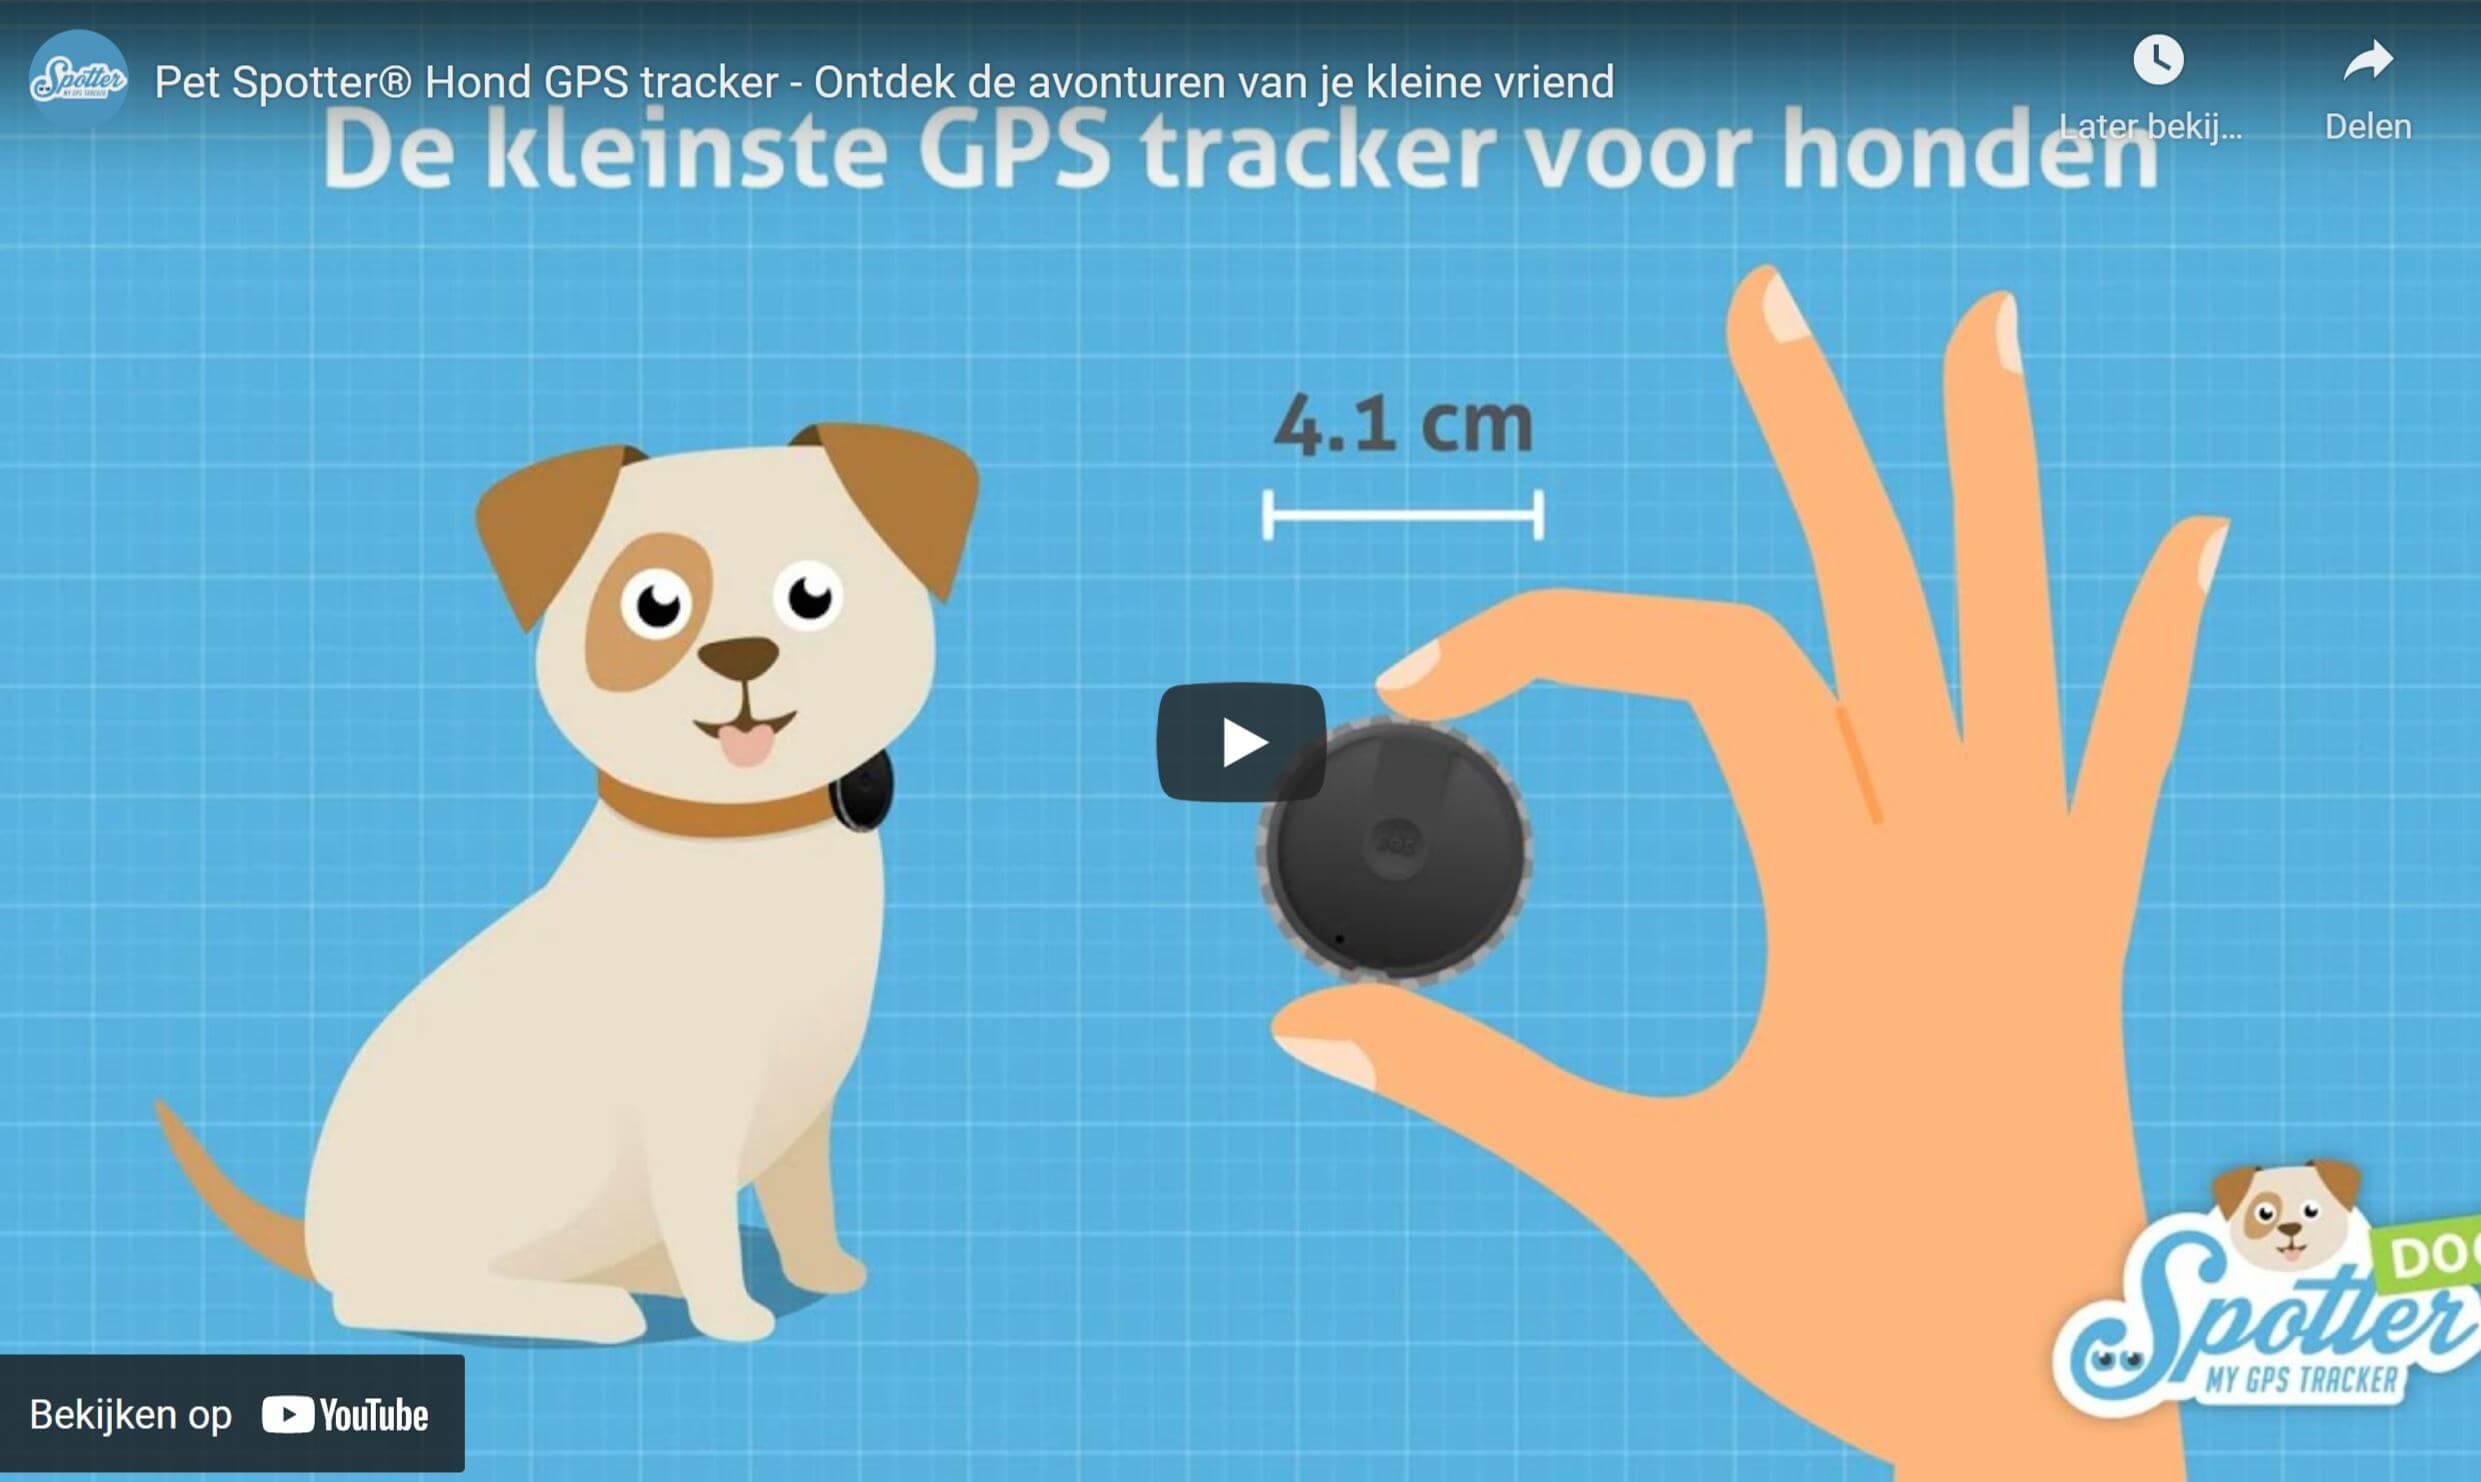 Pet Spotter honden gps tracker video